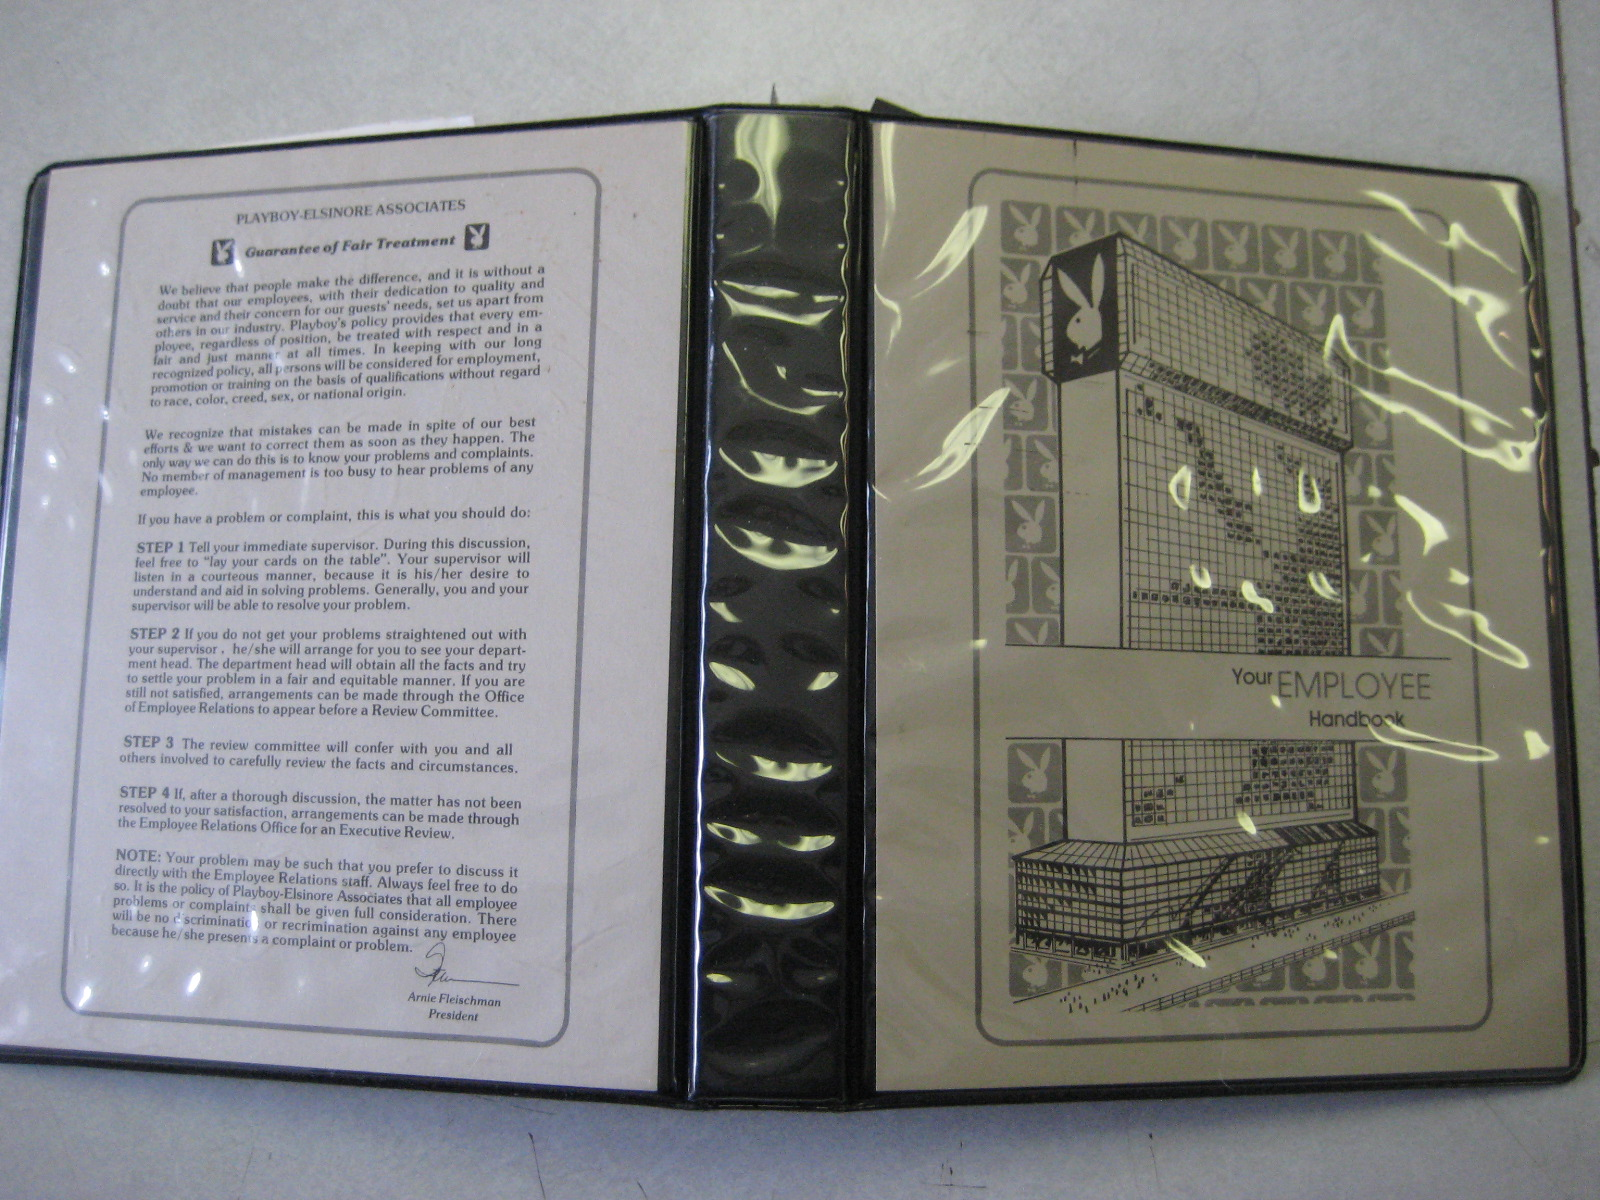 Playboy Atlantic City Employee Handbook